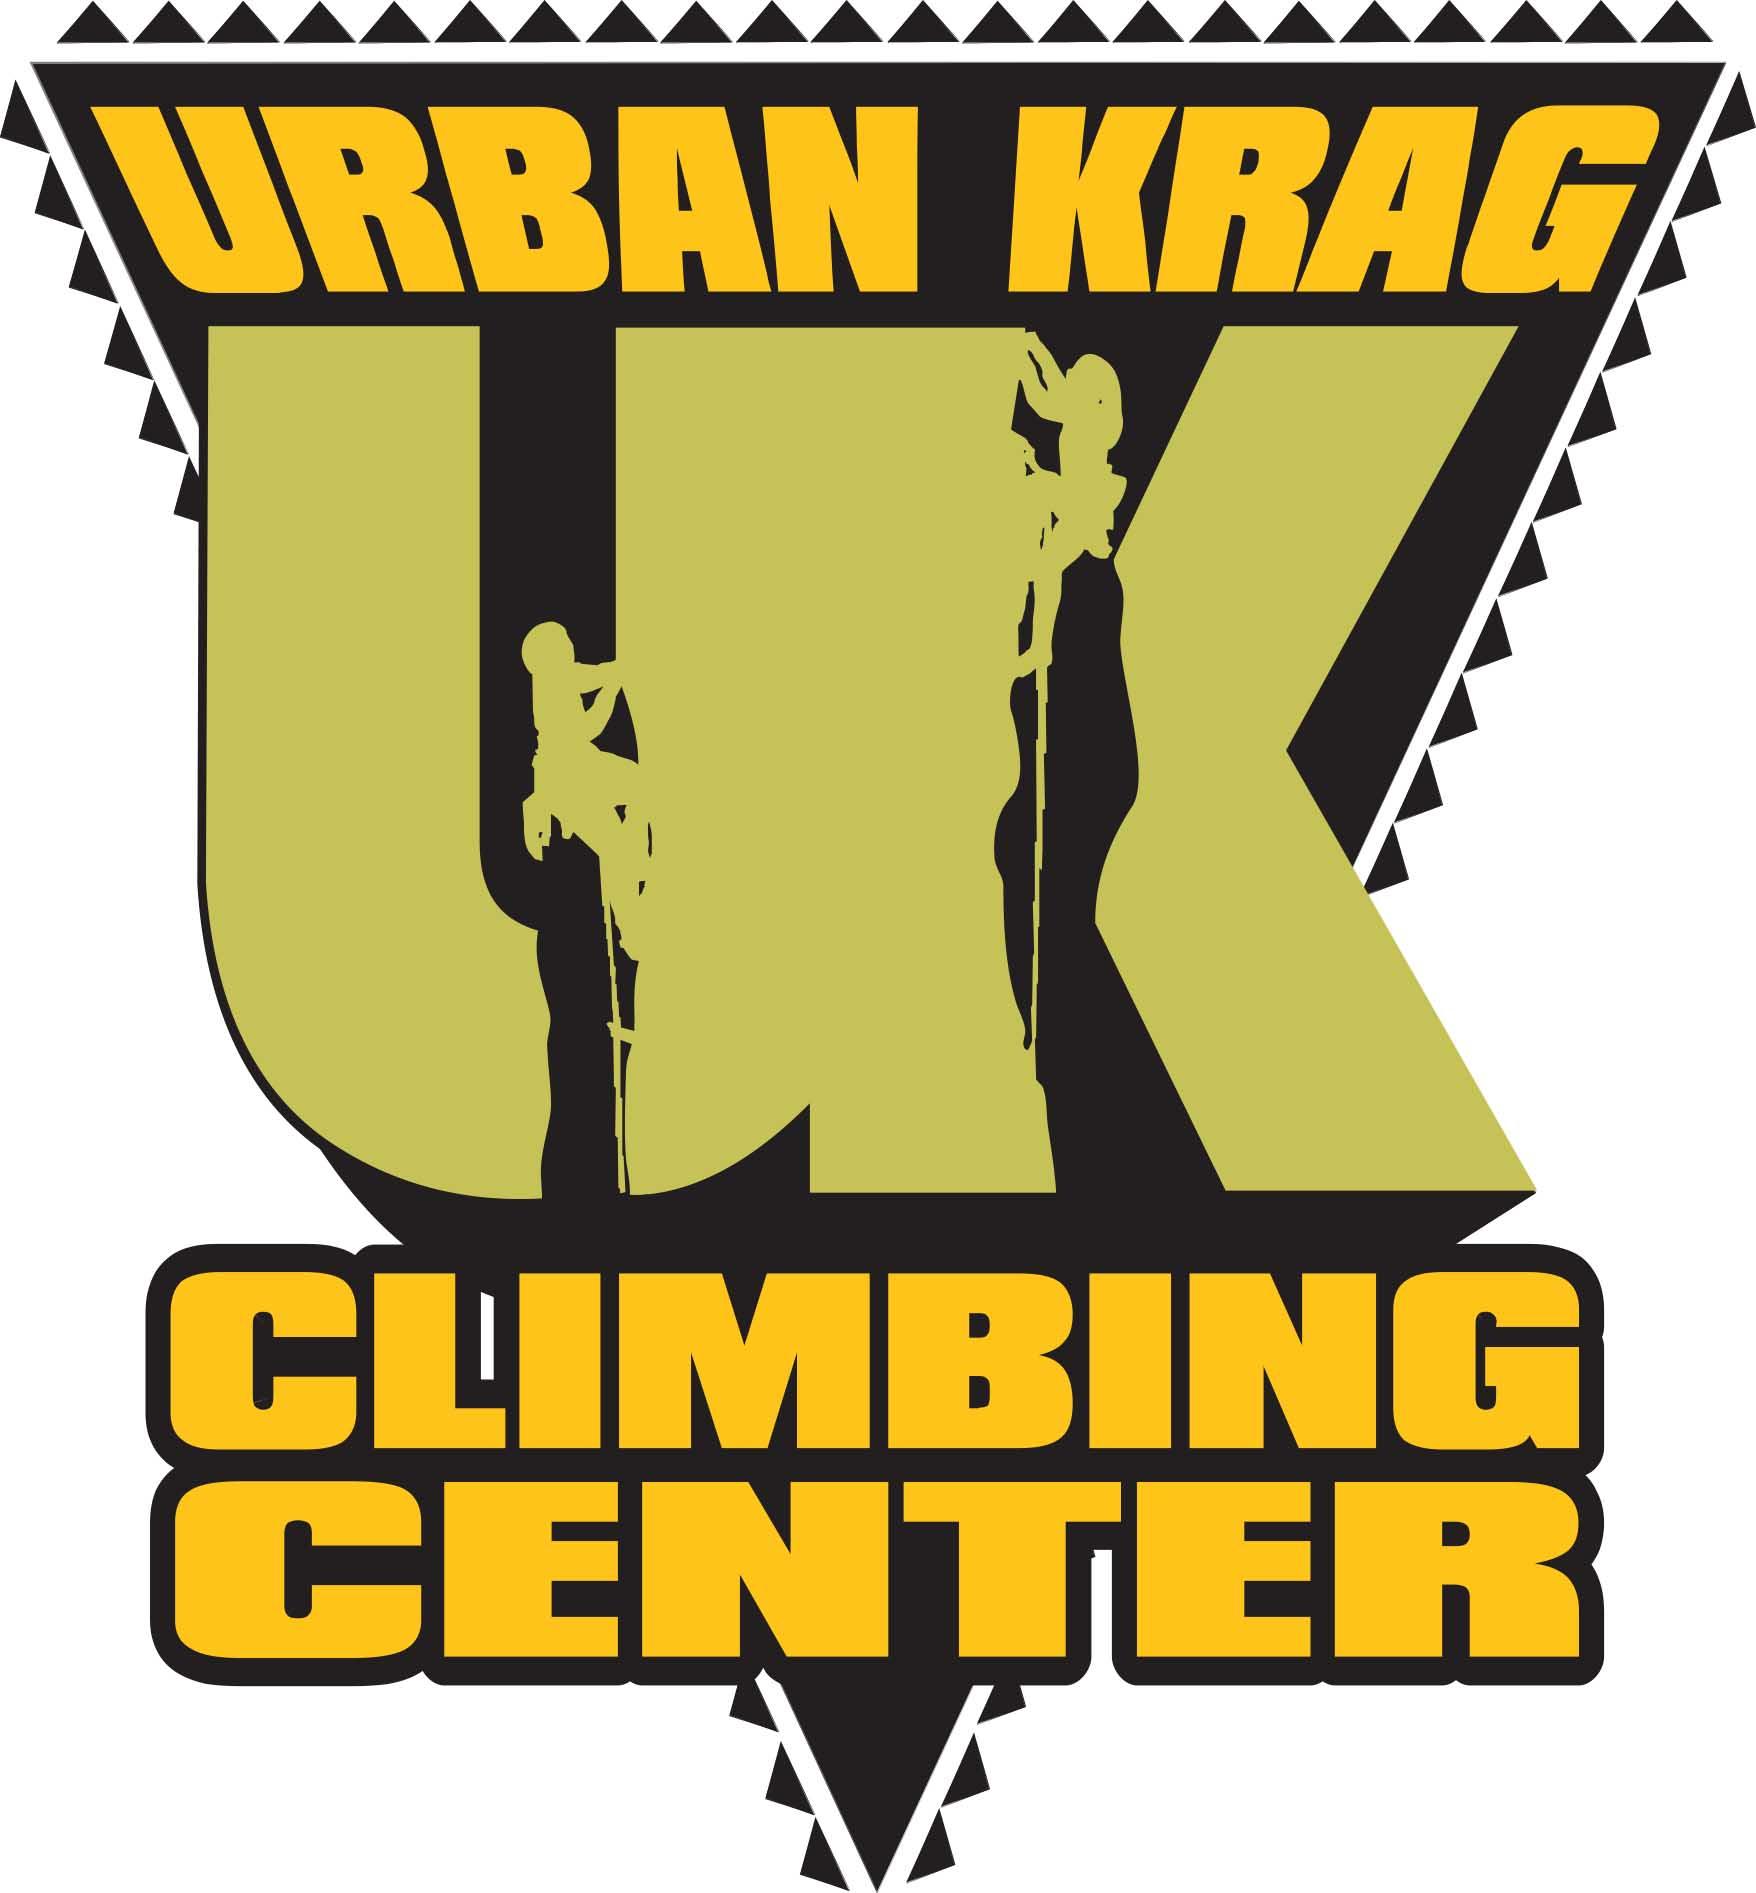 CURRENTUrbanKrag_logo.jpg